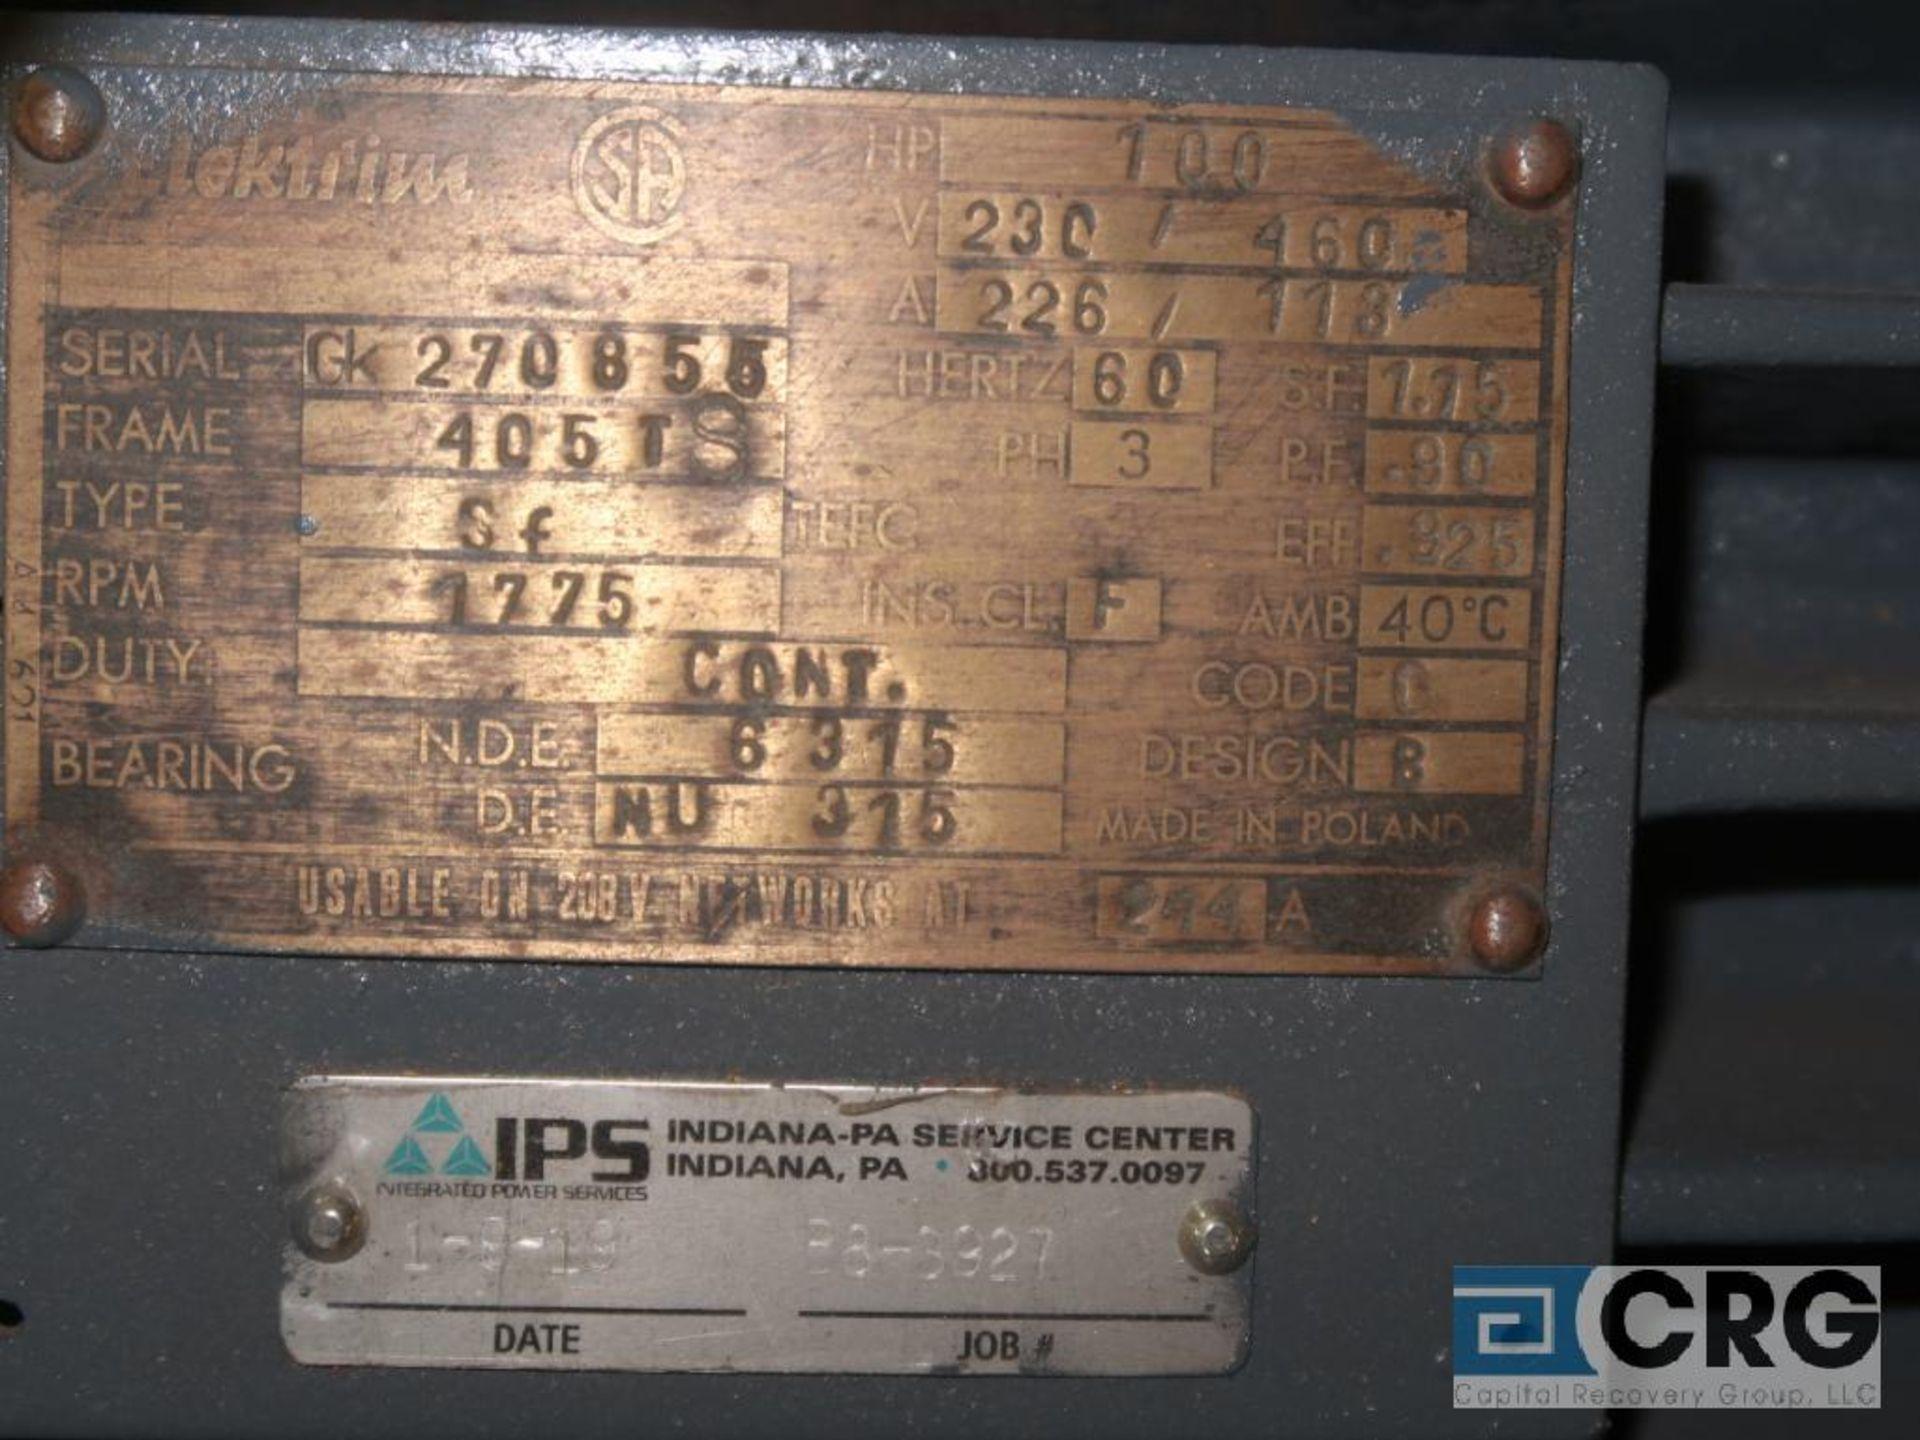 Elektrim motor, 100 HP, 1,775 RPMs, 230/460 volt, 3 ph., 405TS frame (Finish Building) - Image 2 of 2